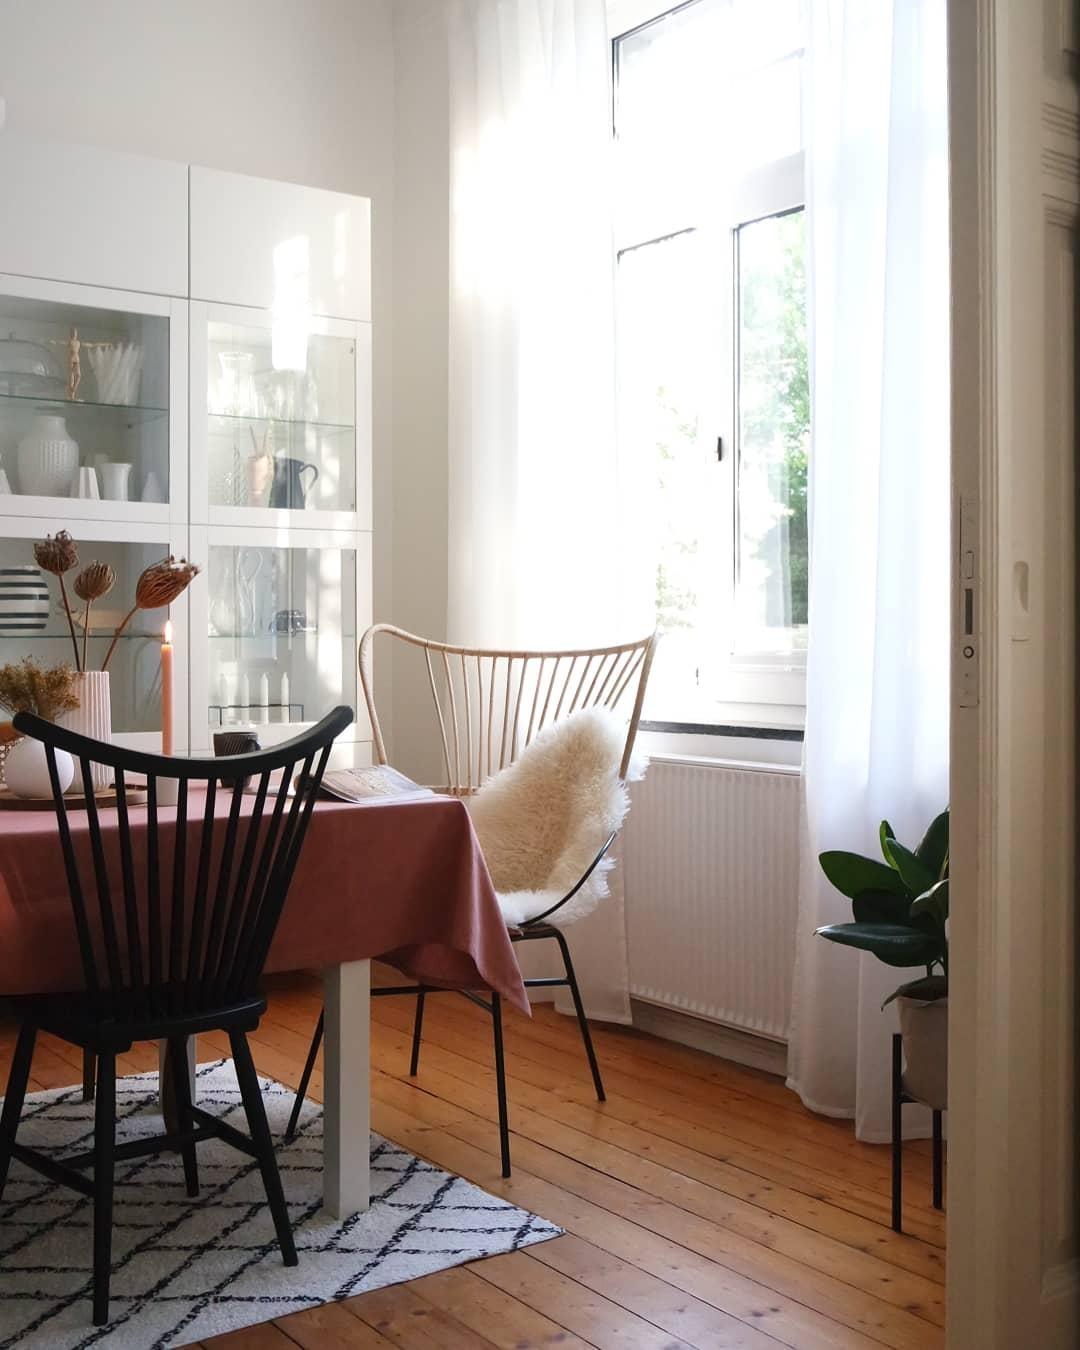 Wohnzimmer Bilder: Lass Dich Inspirieren